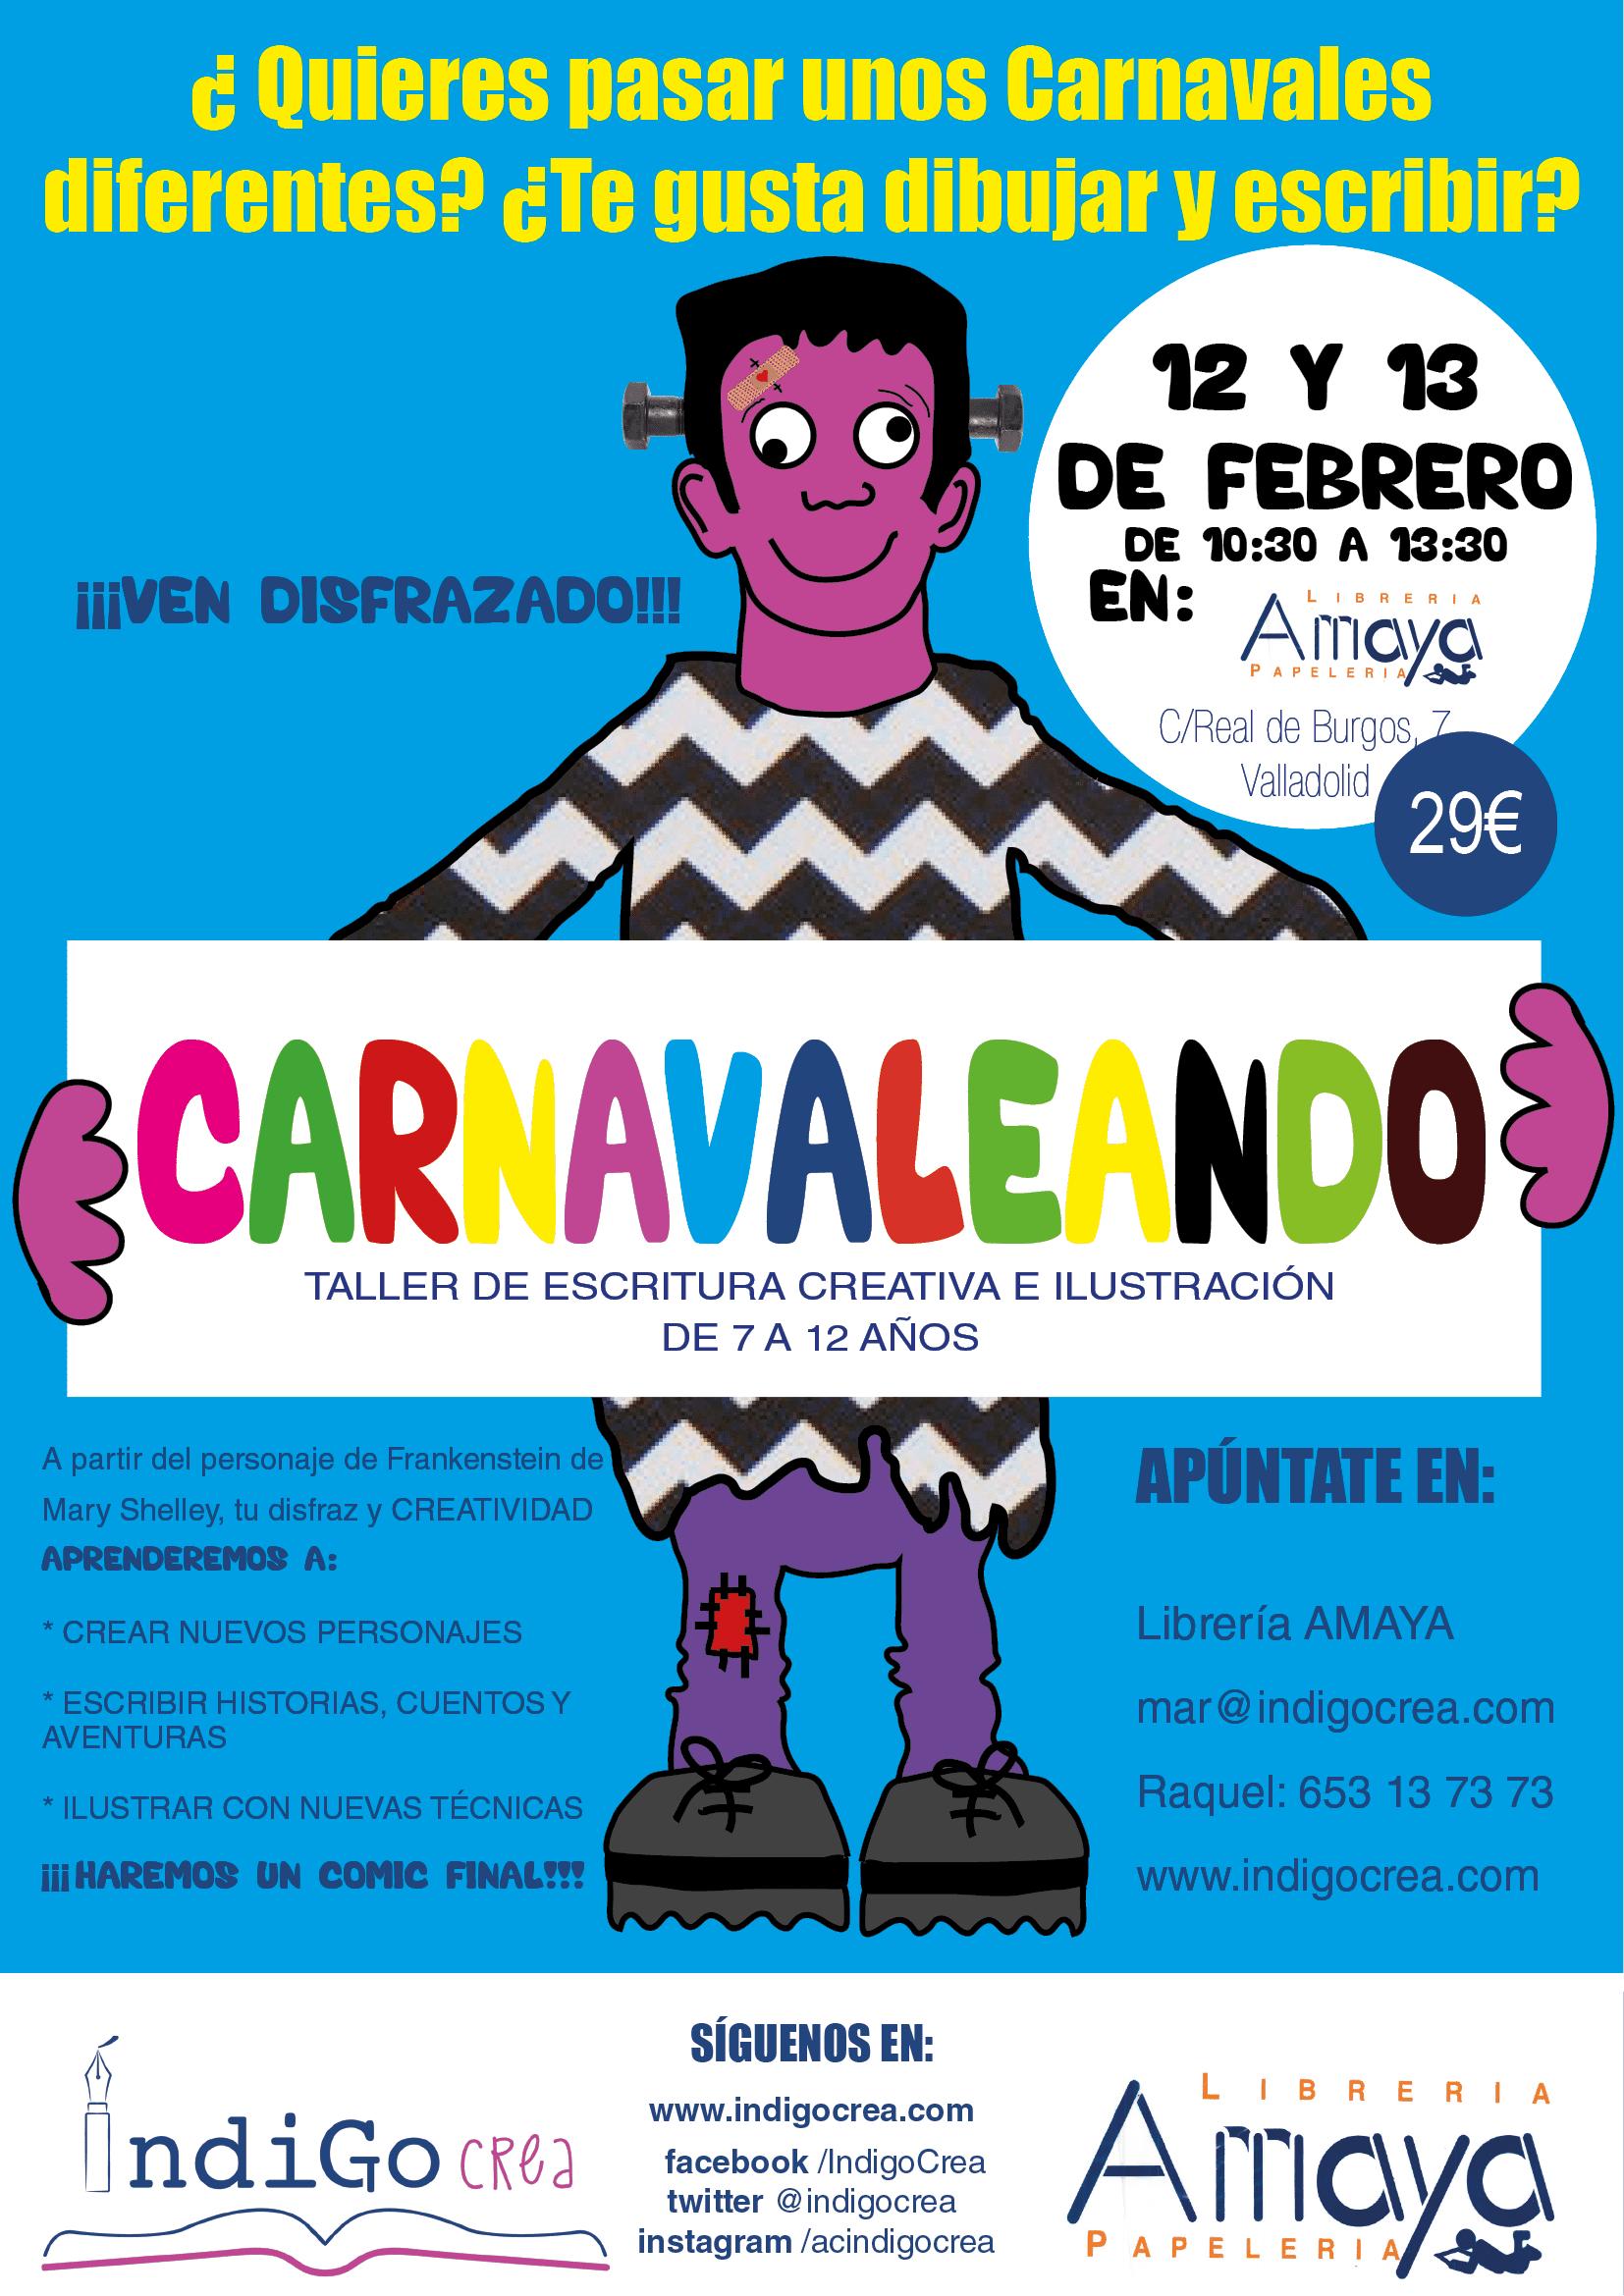 Carnaval, Carnaval